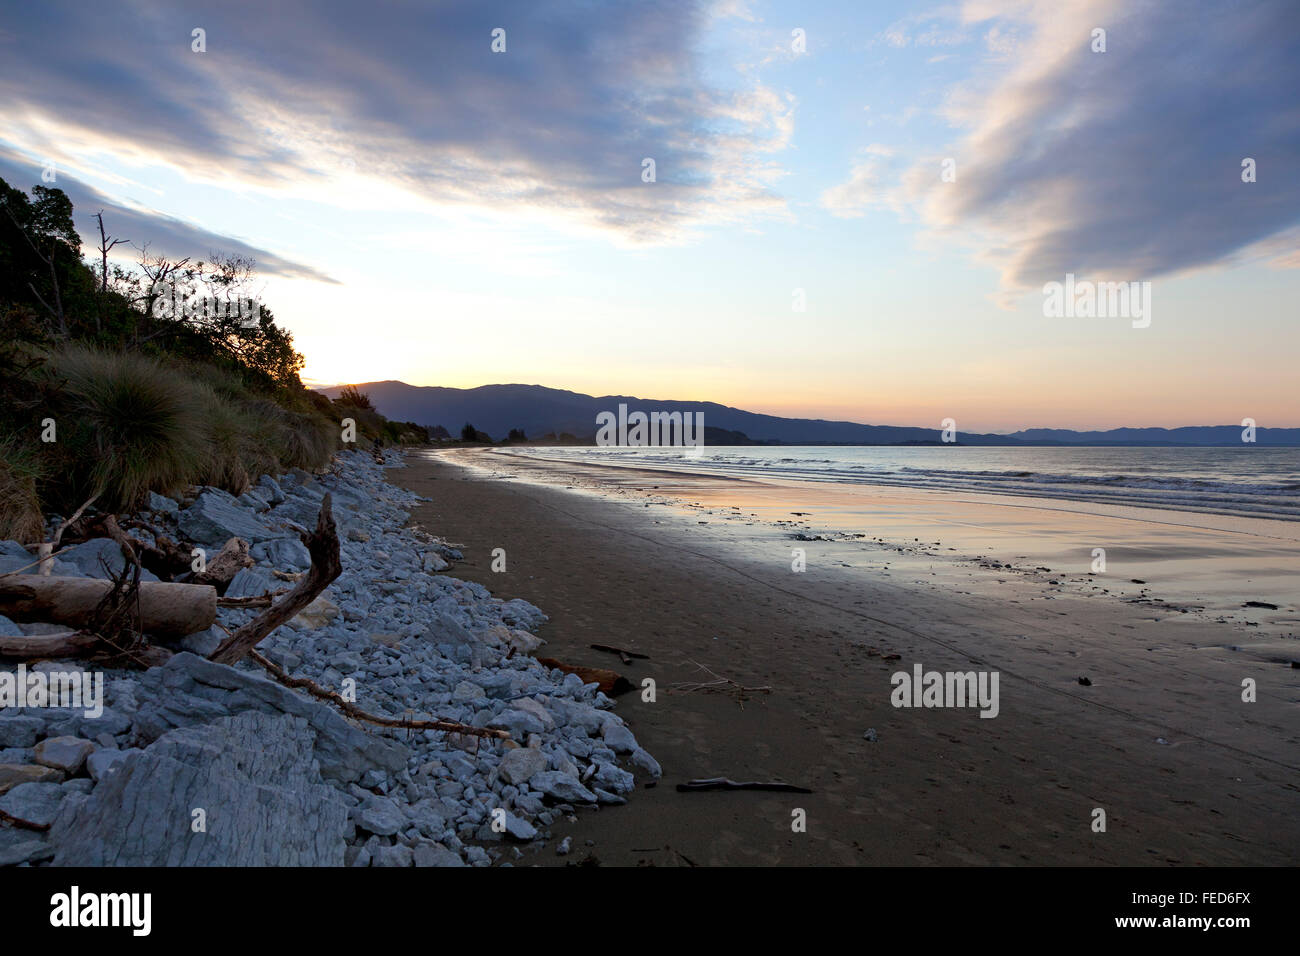 Sunset on the beach of the Marlborough Sounds New Zealand Stock Photo